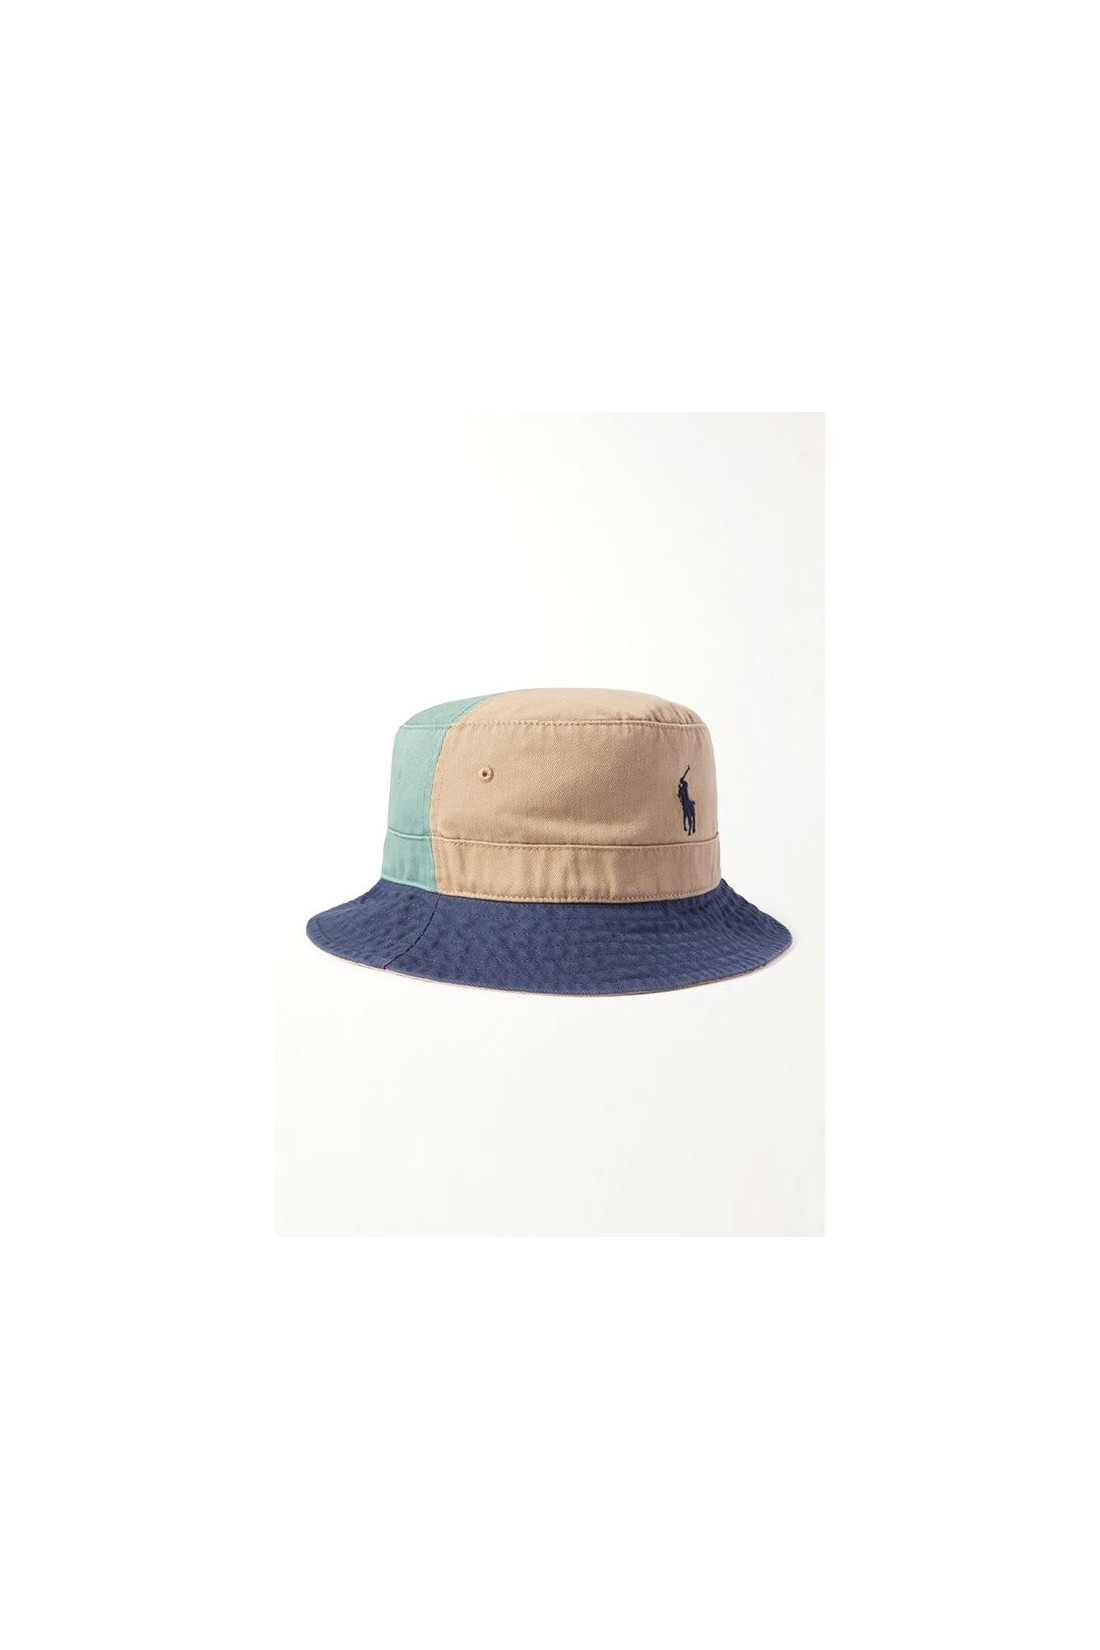 POLO RALPH LAUREN / Loft bucket hat cotton chino Multi